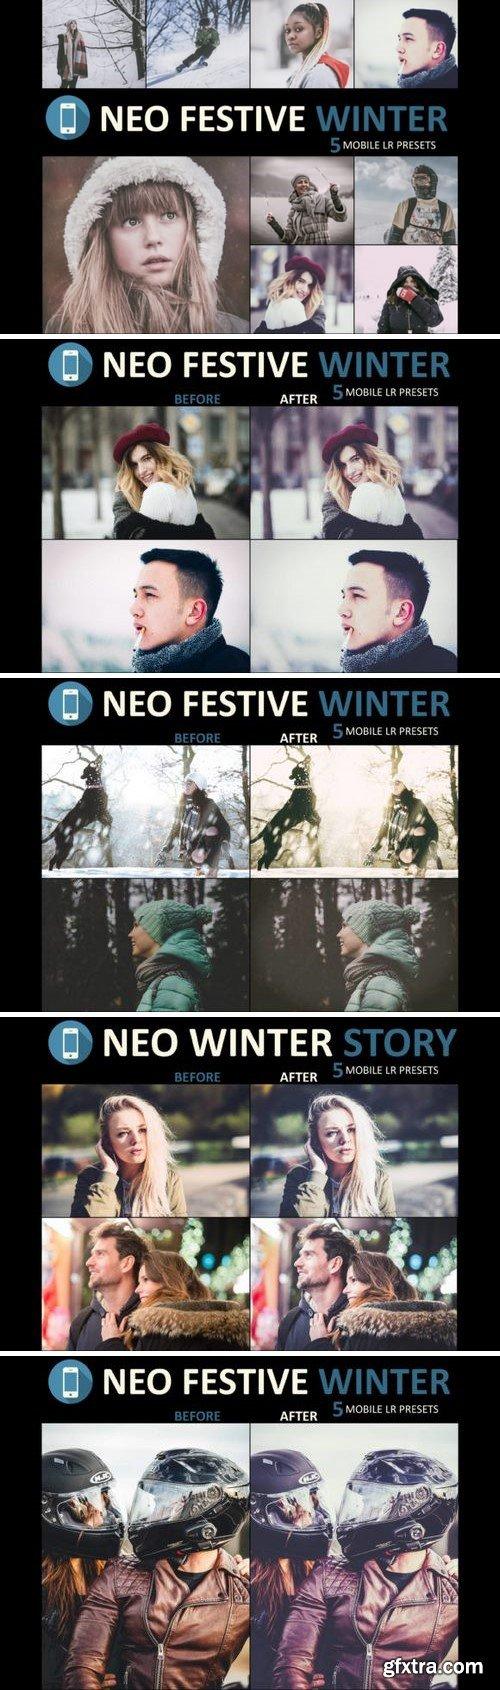 Thehungryjpeg - Neo Festive Winter Story mobile lightroom presets 3524678